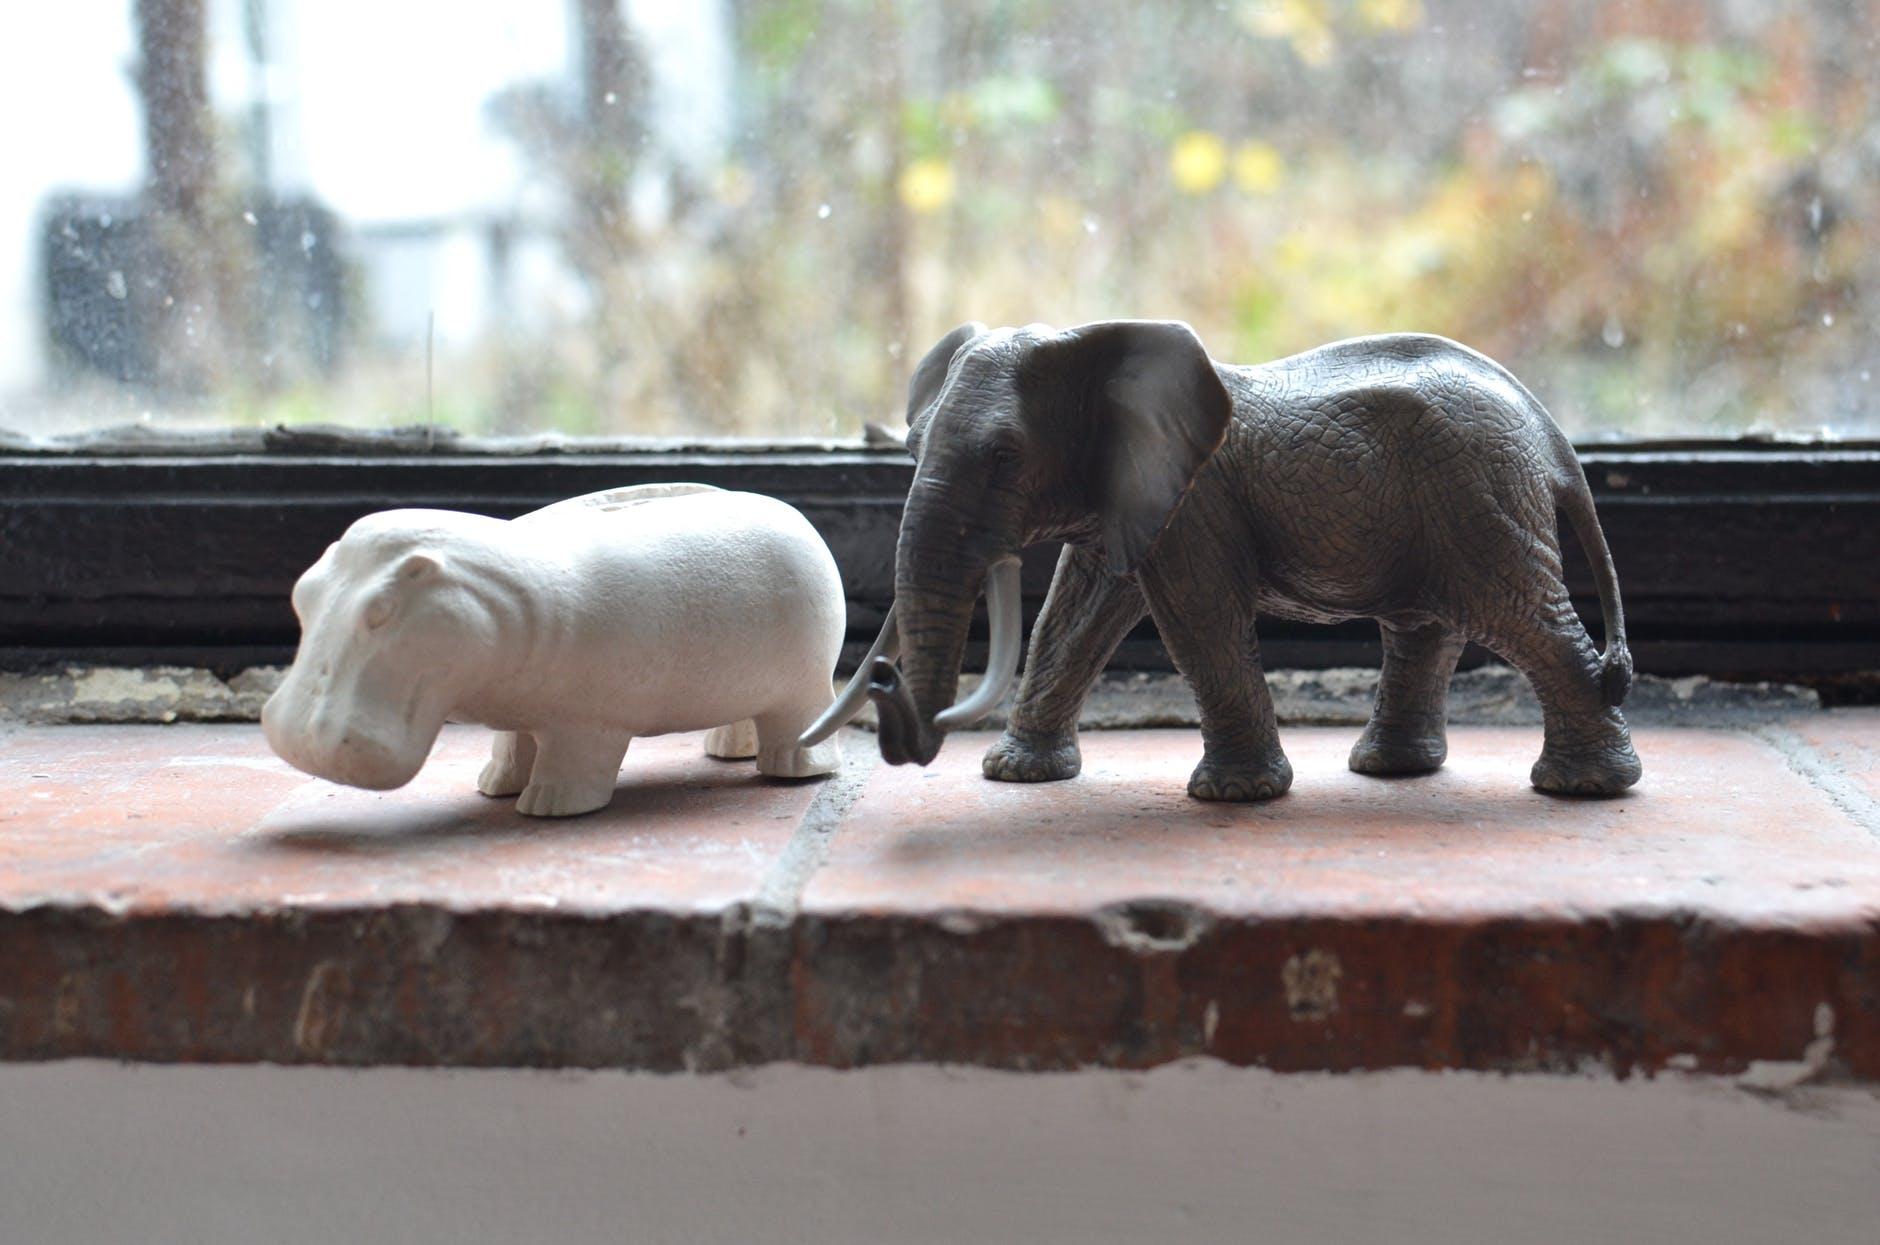 statuette of elephant and hippopotamus on windowsill